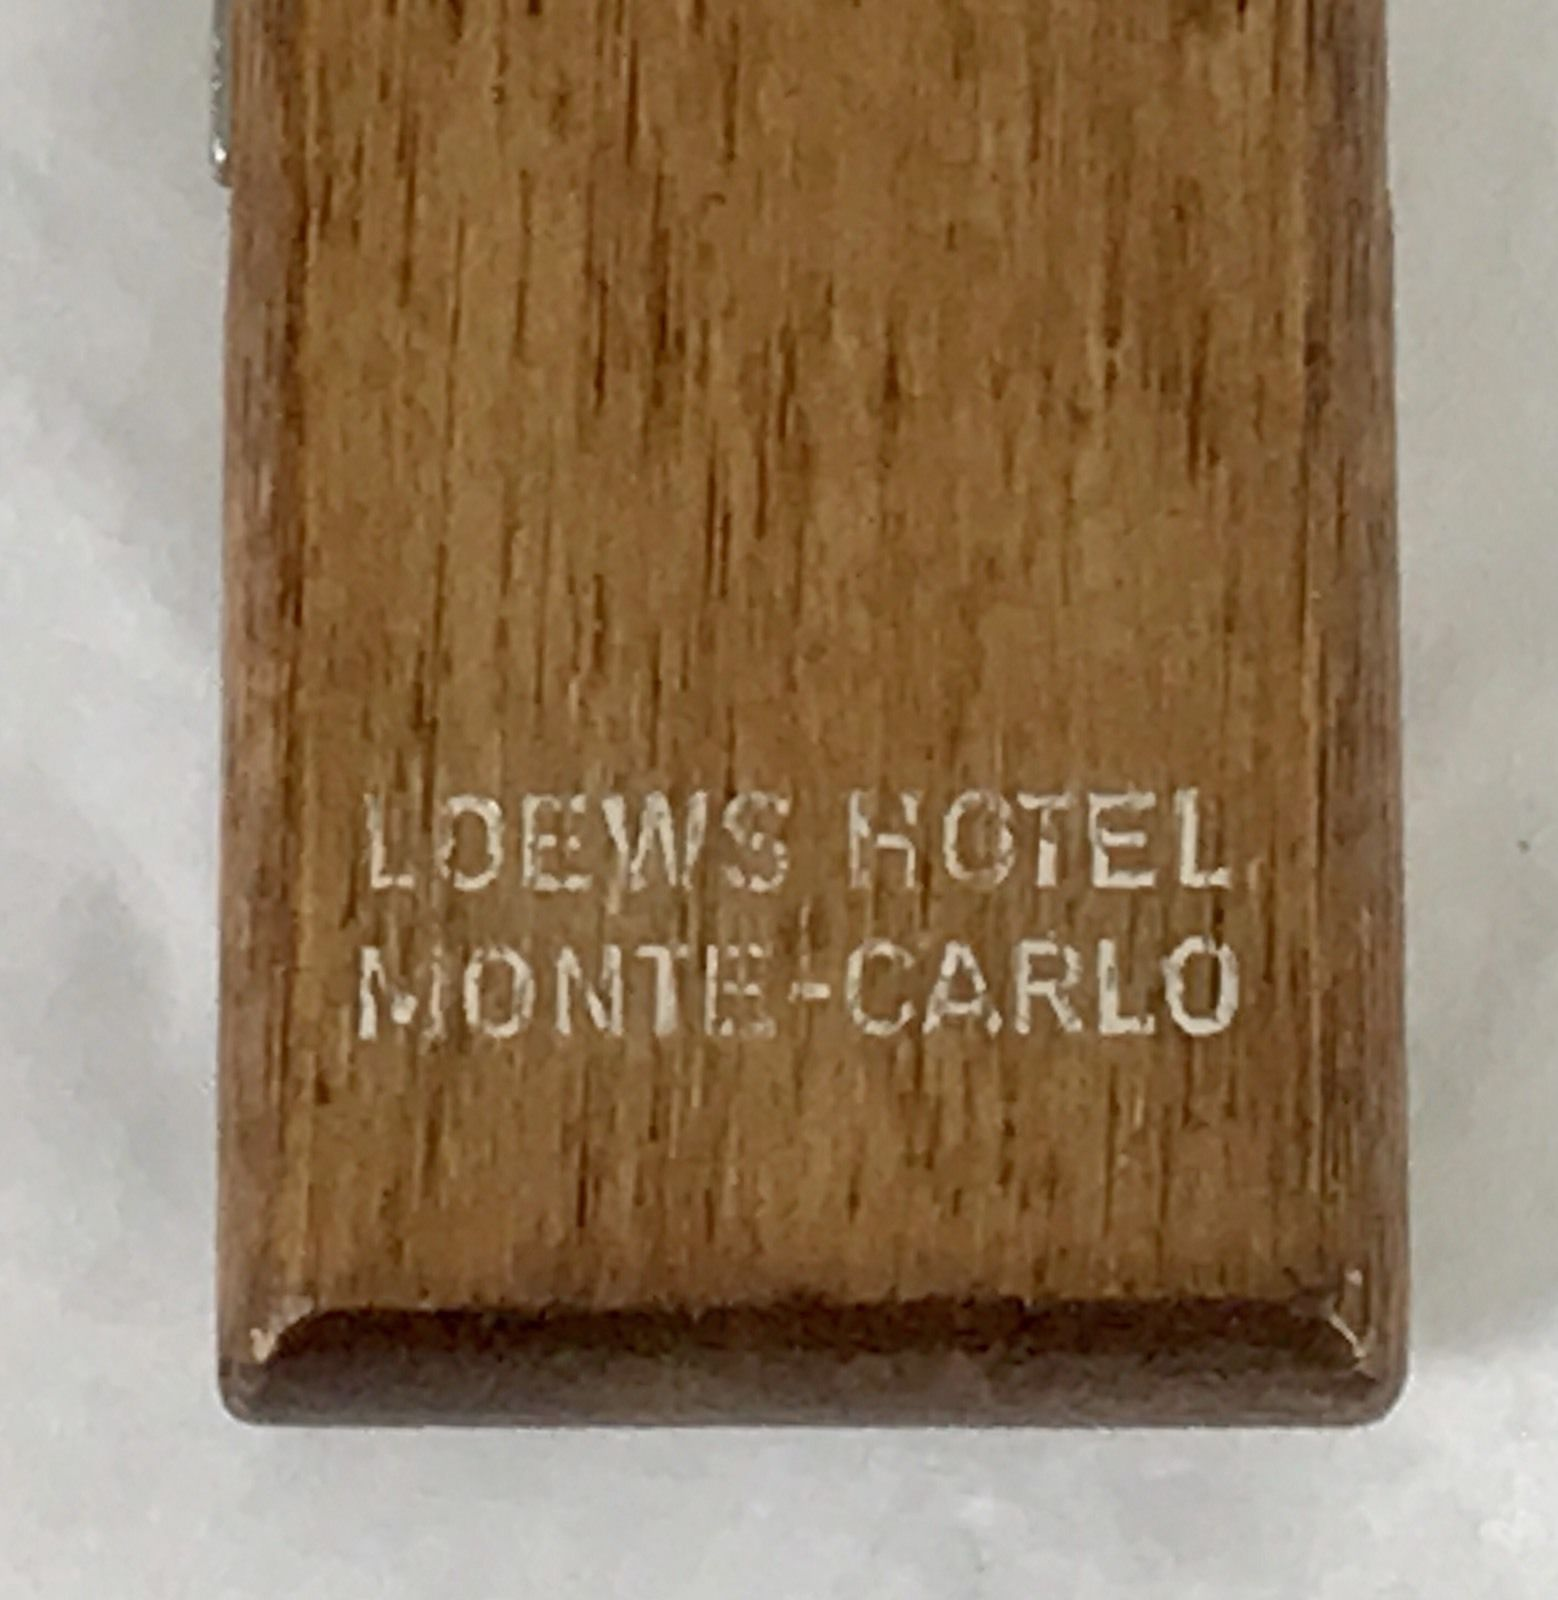 Vintage Loews Hotel Monte Carlo Casino French Riviera Bottle Opener MId Century